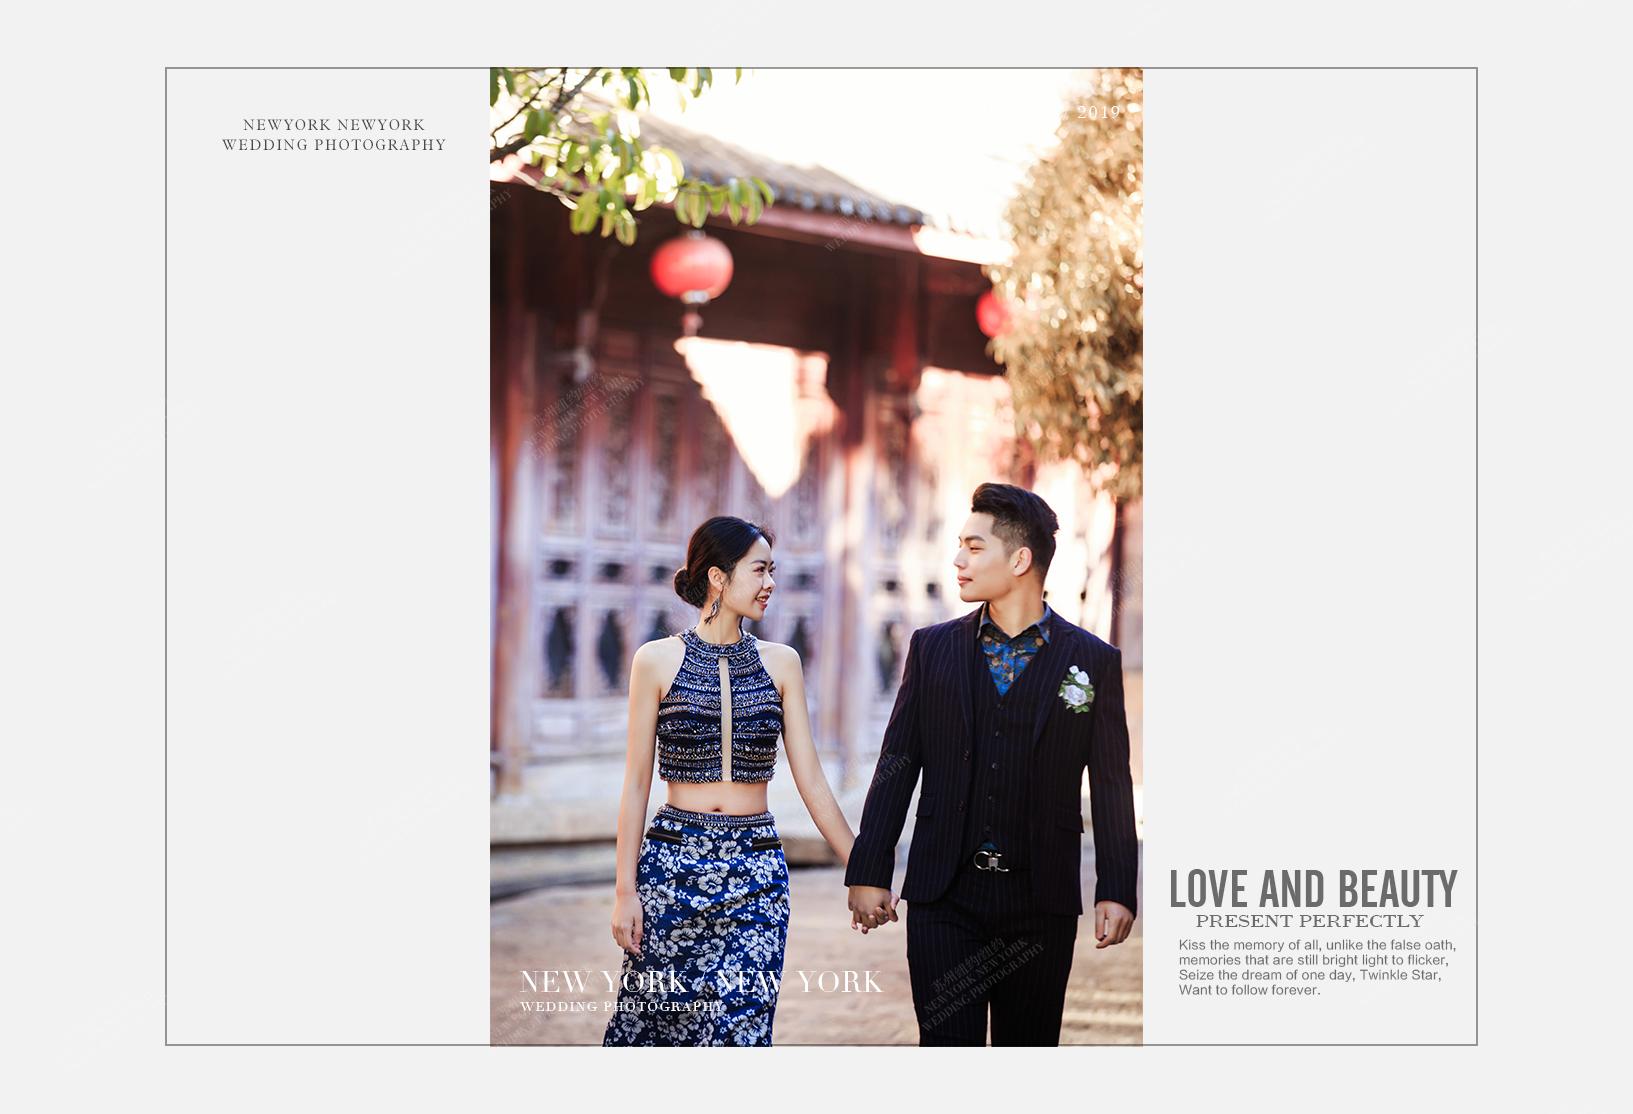 Mr.郭 & Ms.朱(纽约纽约-丽江旅拍)婚纱摄影照